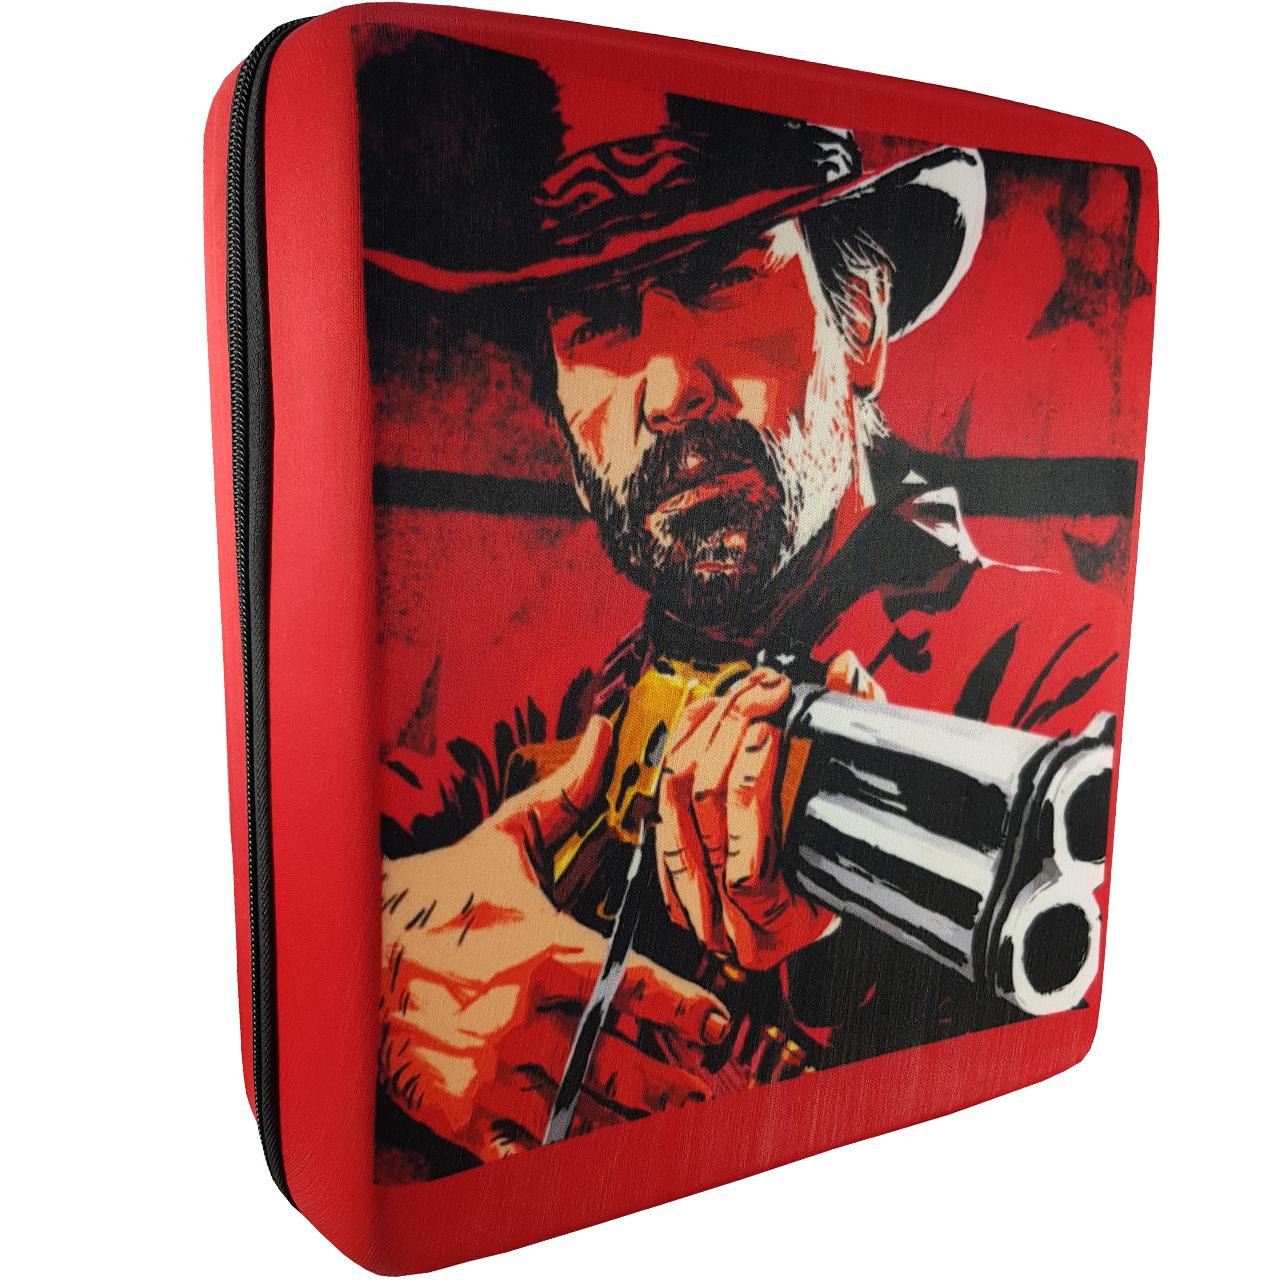 کیف کنسول پلی استیشن 4 طرح Red Dead Redemption 2